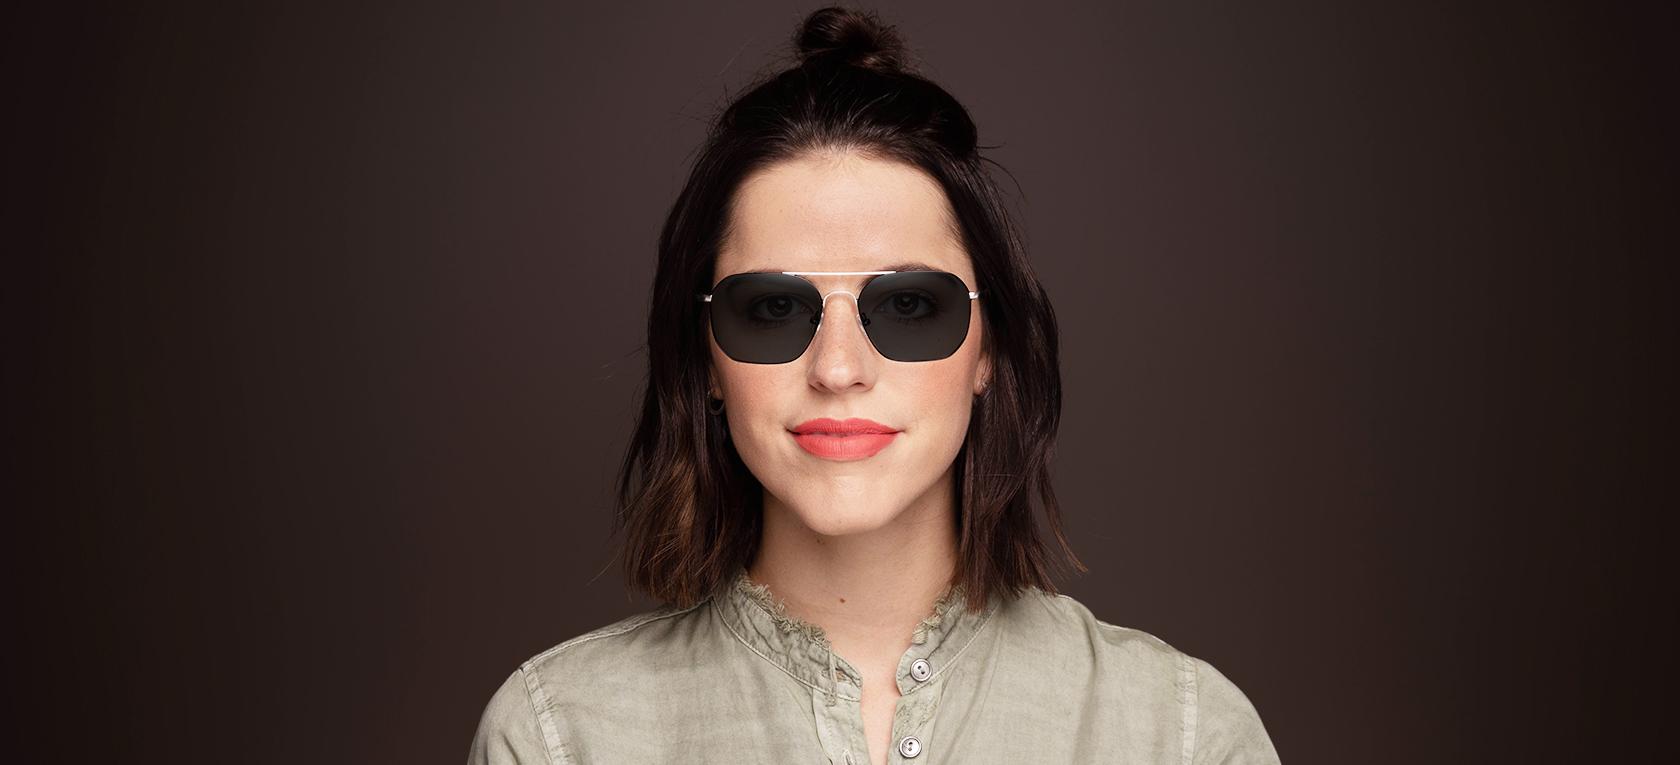 Image of model wearing frame